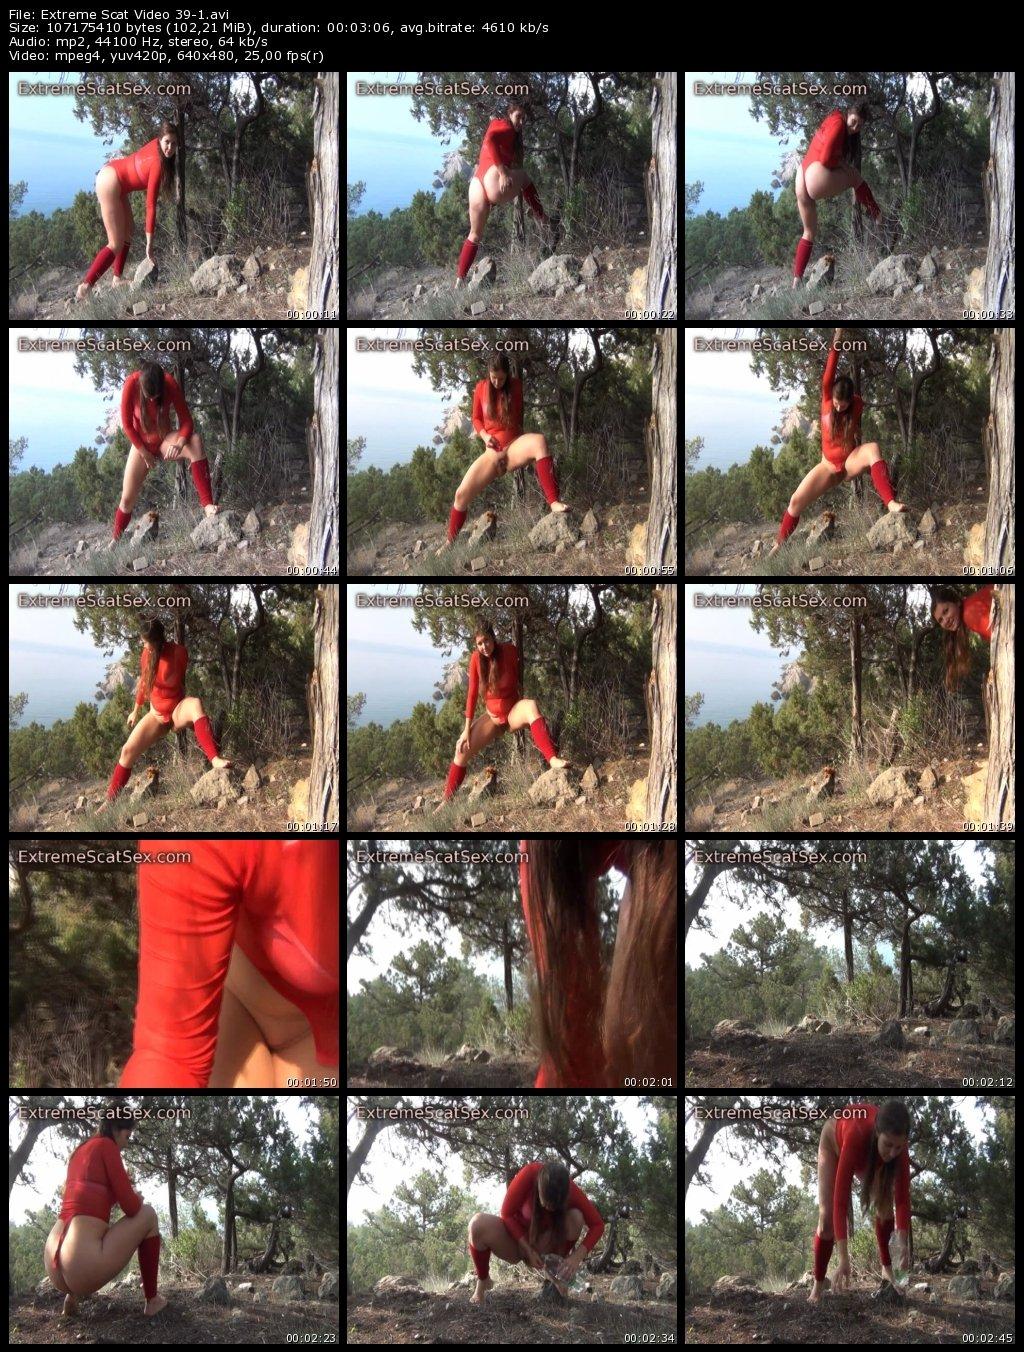 Extreme Scat Video 39-1